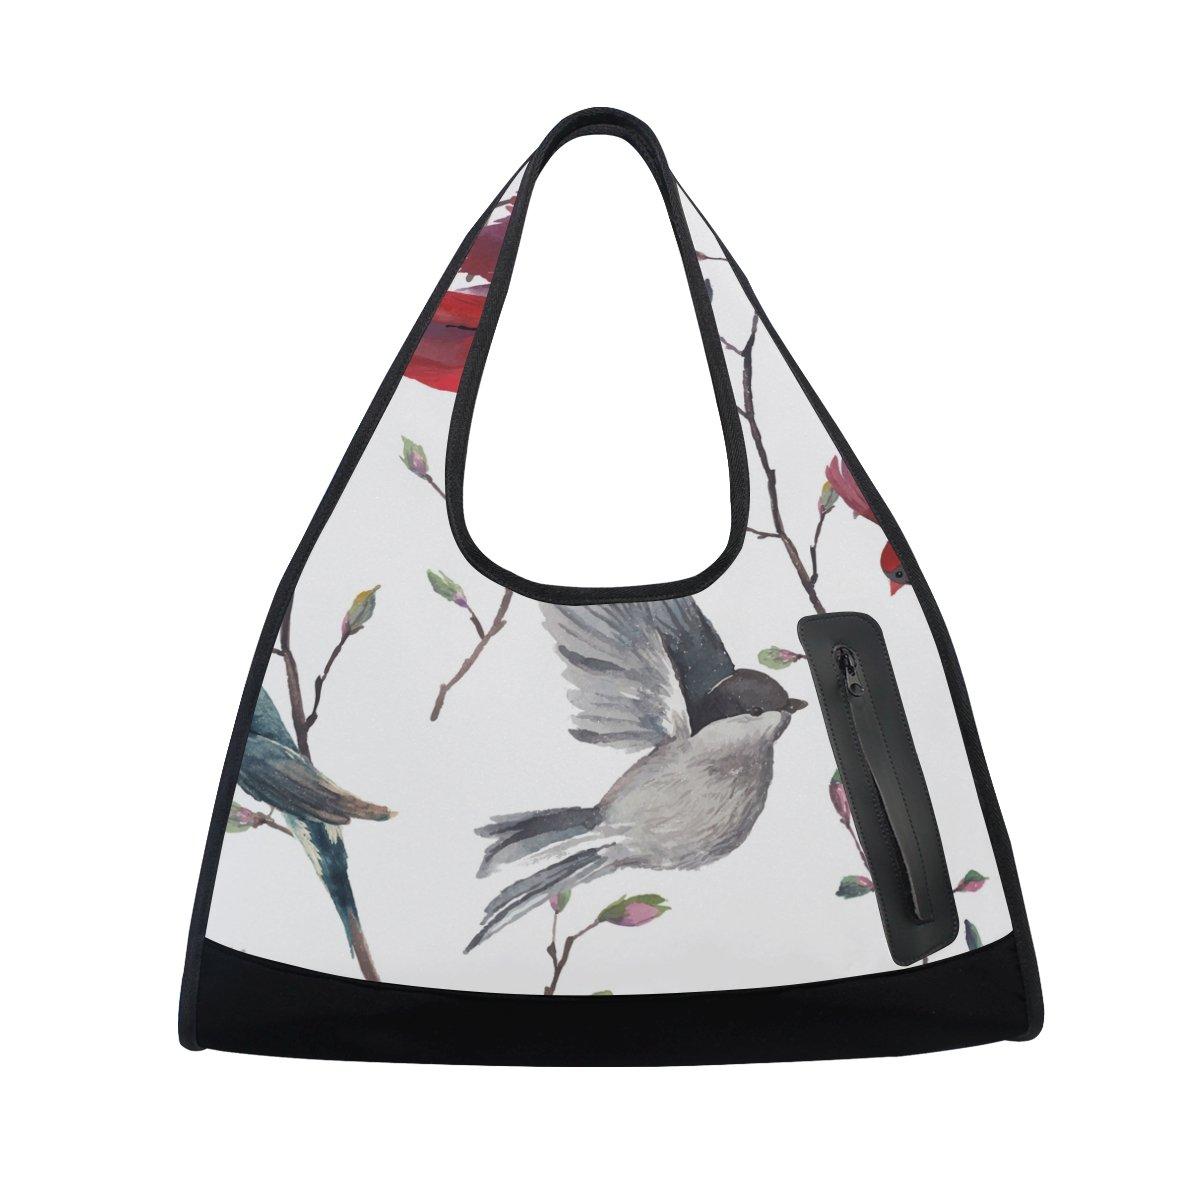 AHOMY Canvas Sports Gym Bag Branches Flowers Bird Travel Shoulder Bag